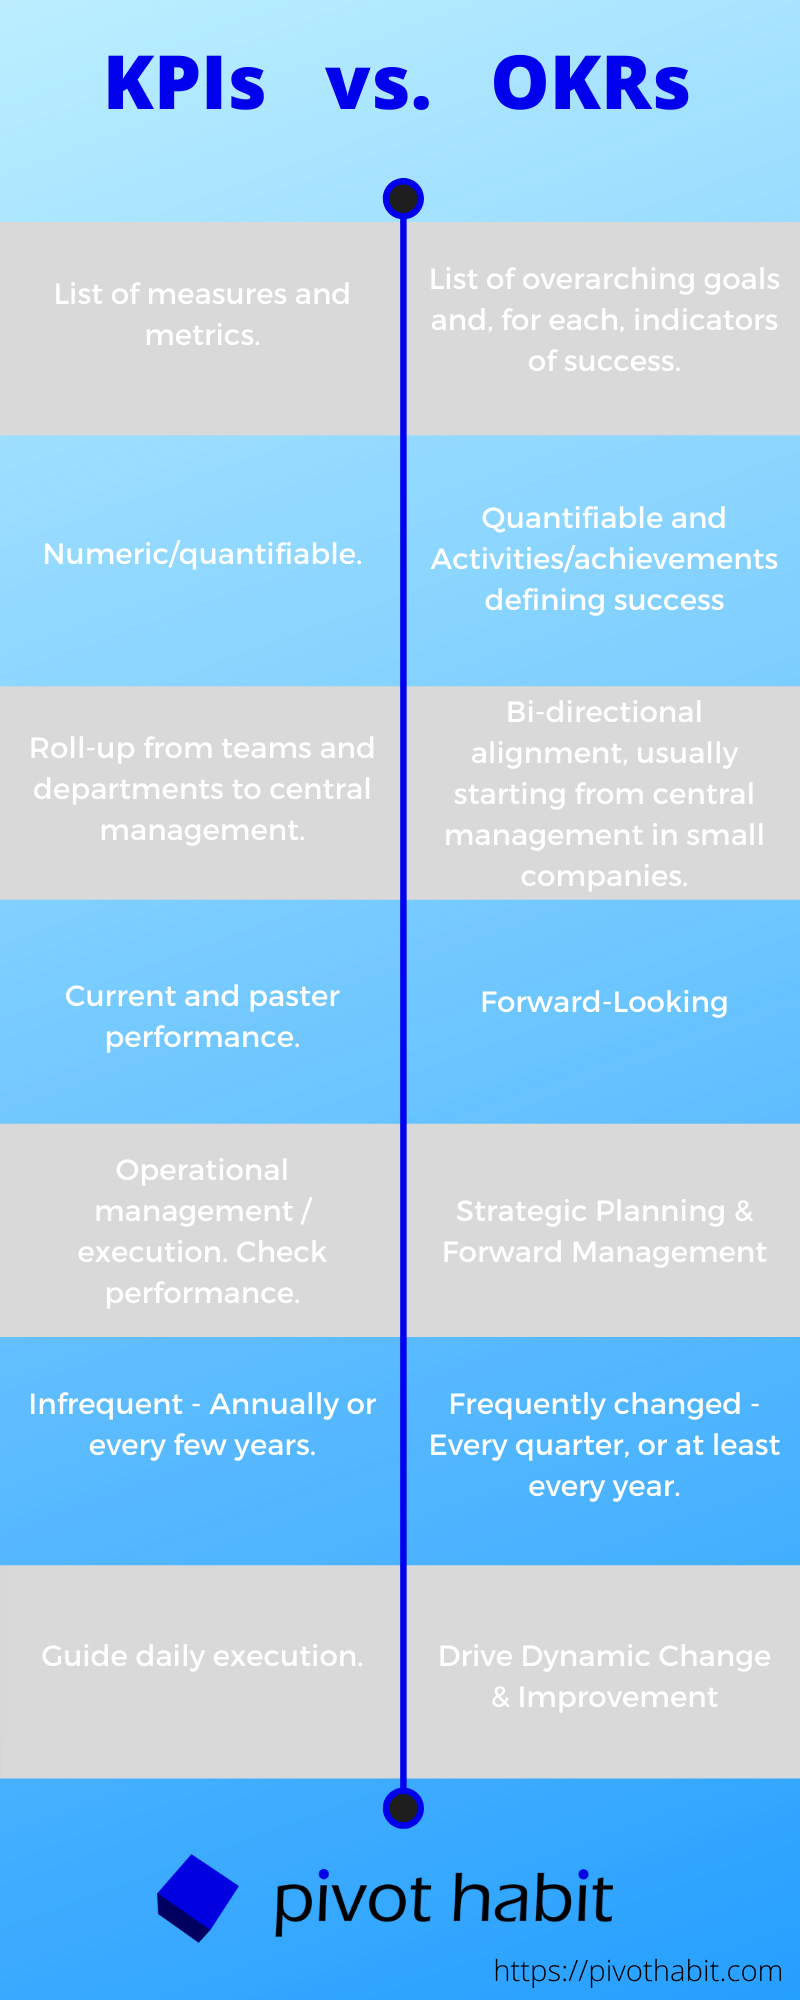 A comparison of KPI features vs OKR features.